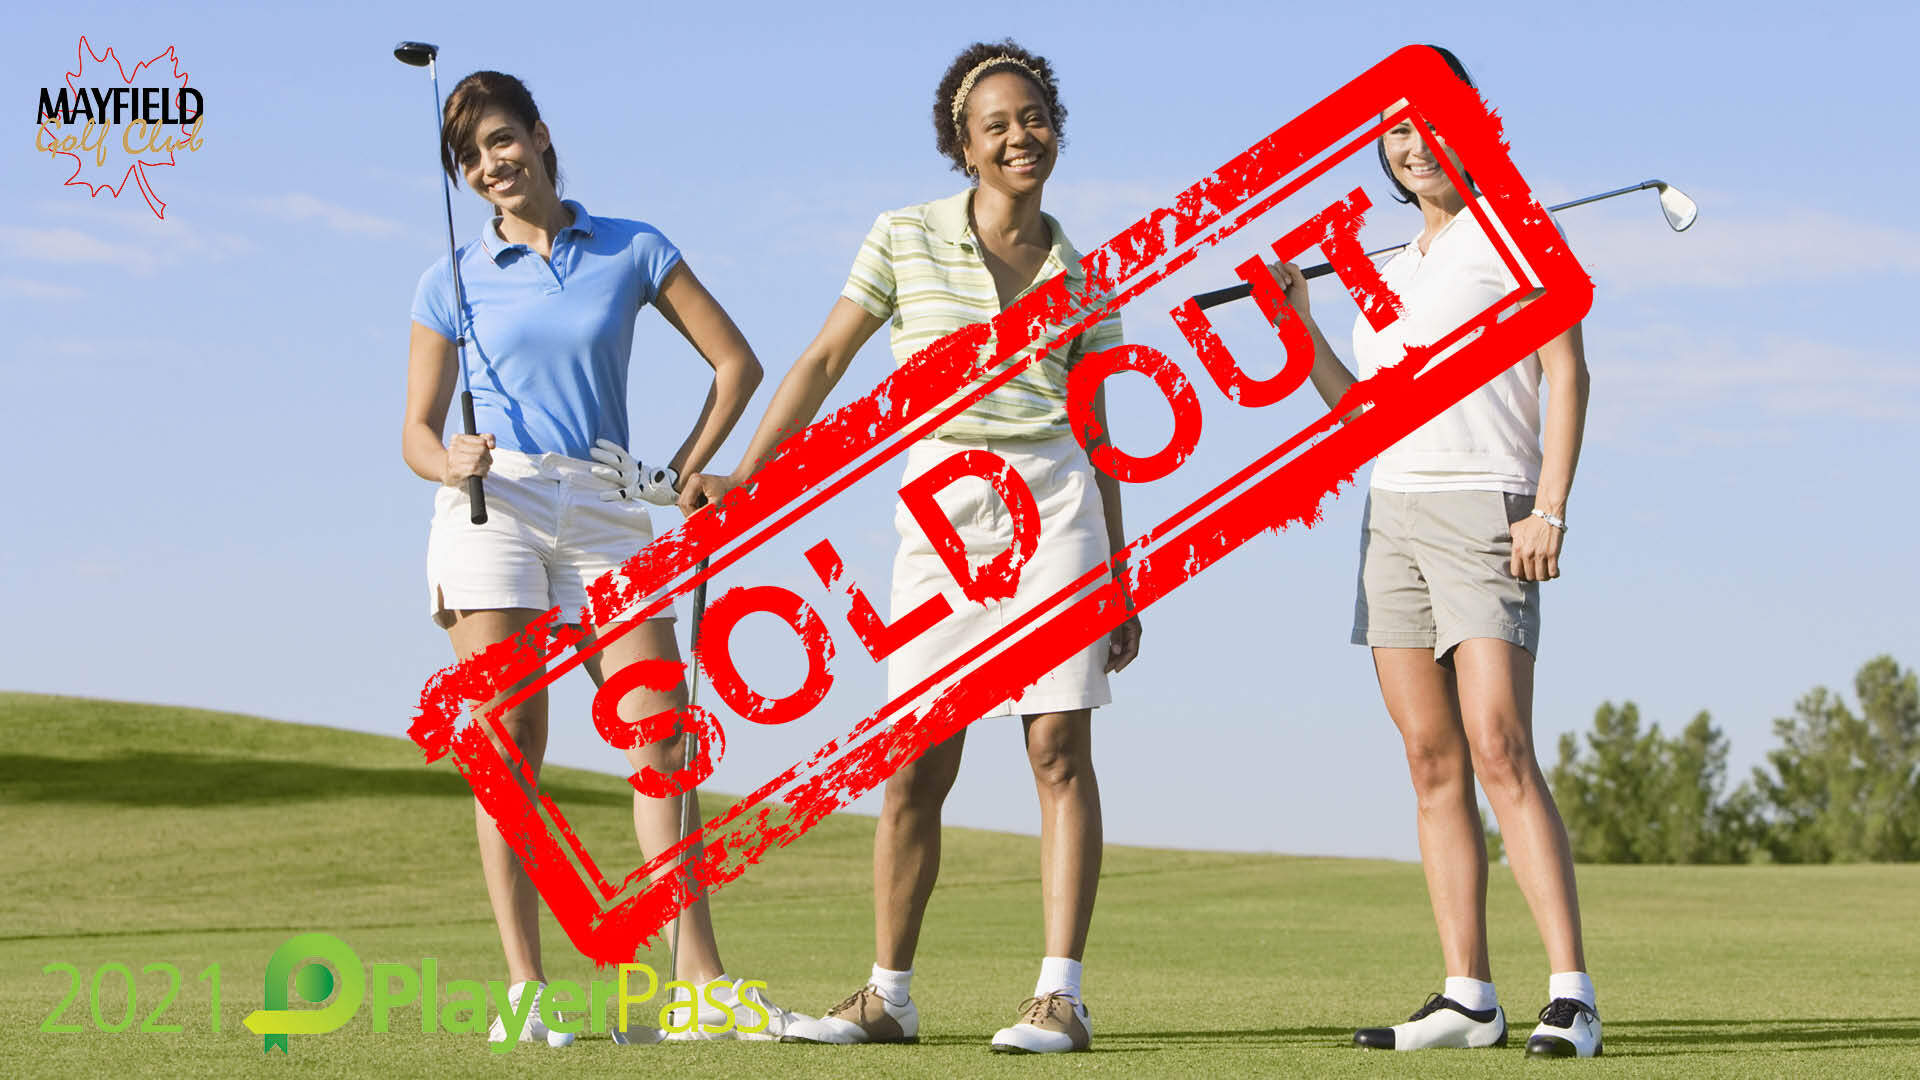 3 happy women golfers standing on the tee